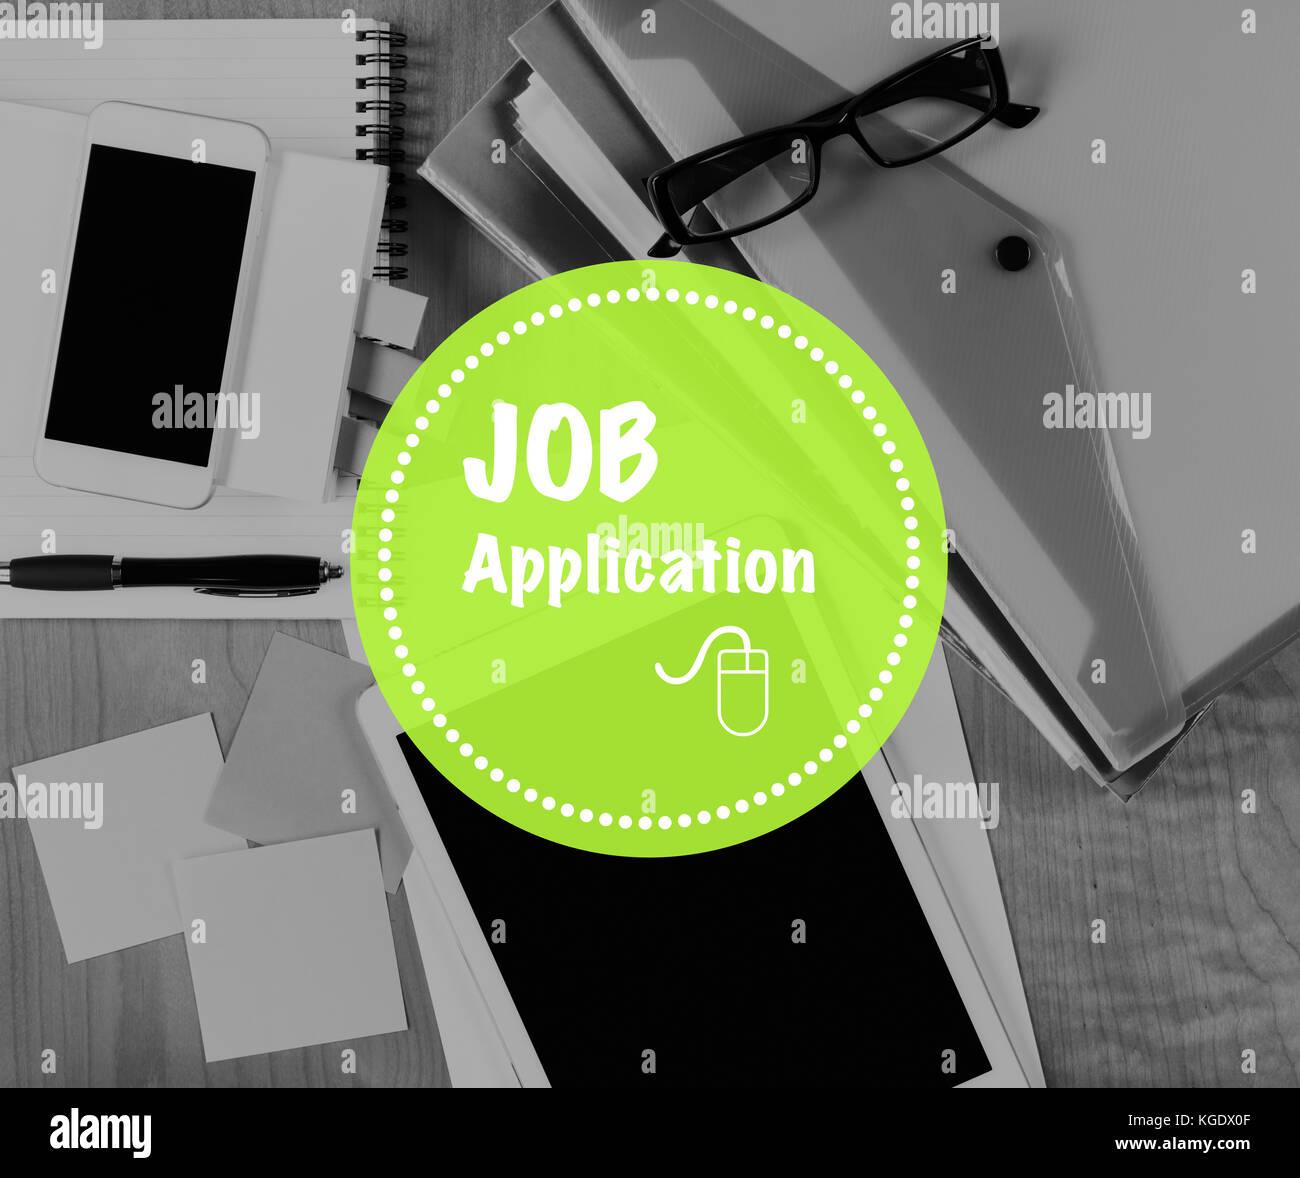 Online Job Application Career Employment Concept - Stock Image